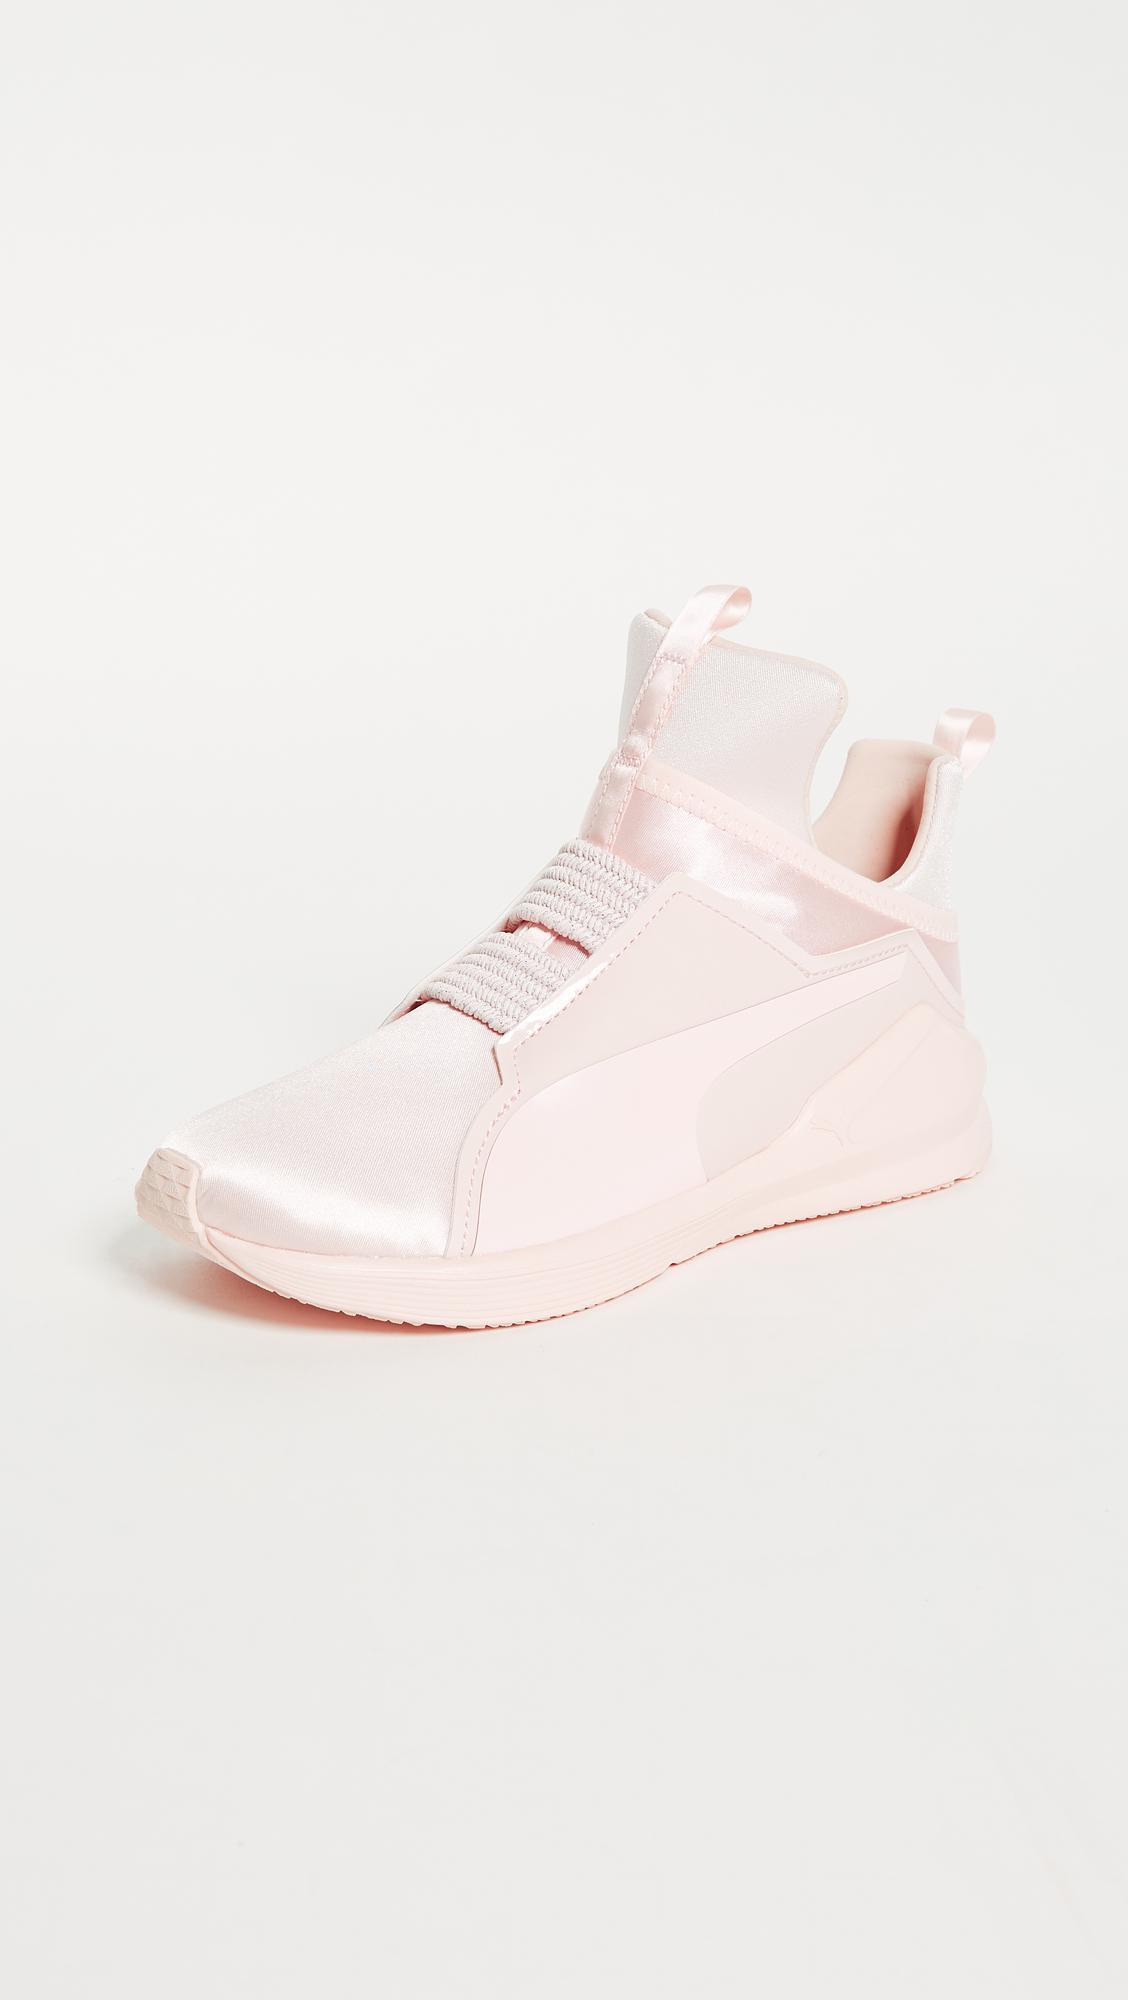 Puma Fierce Satin Ep Sneakers in Pink - Lyst 6cf9f92eb